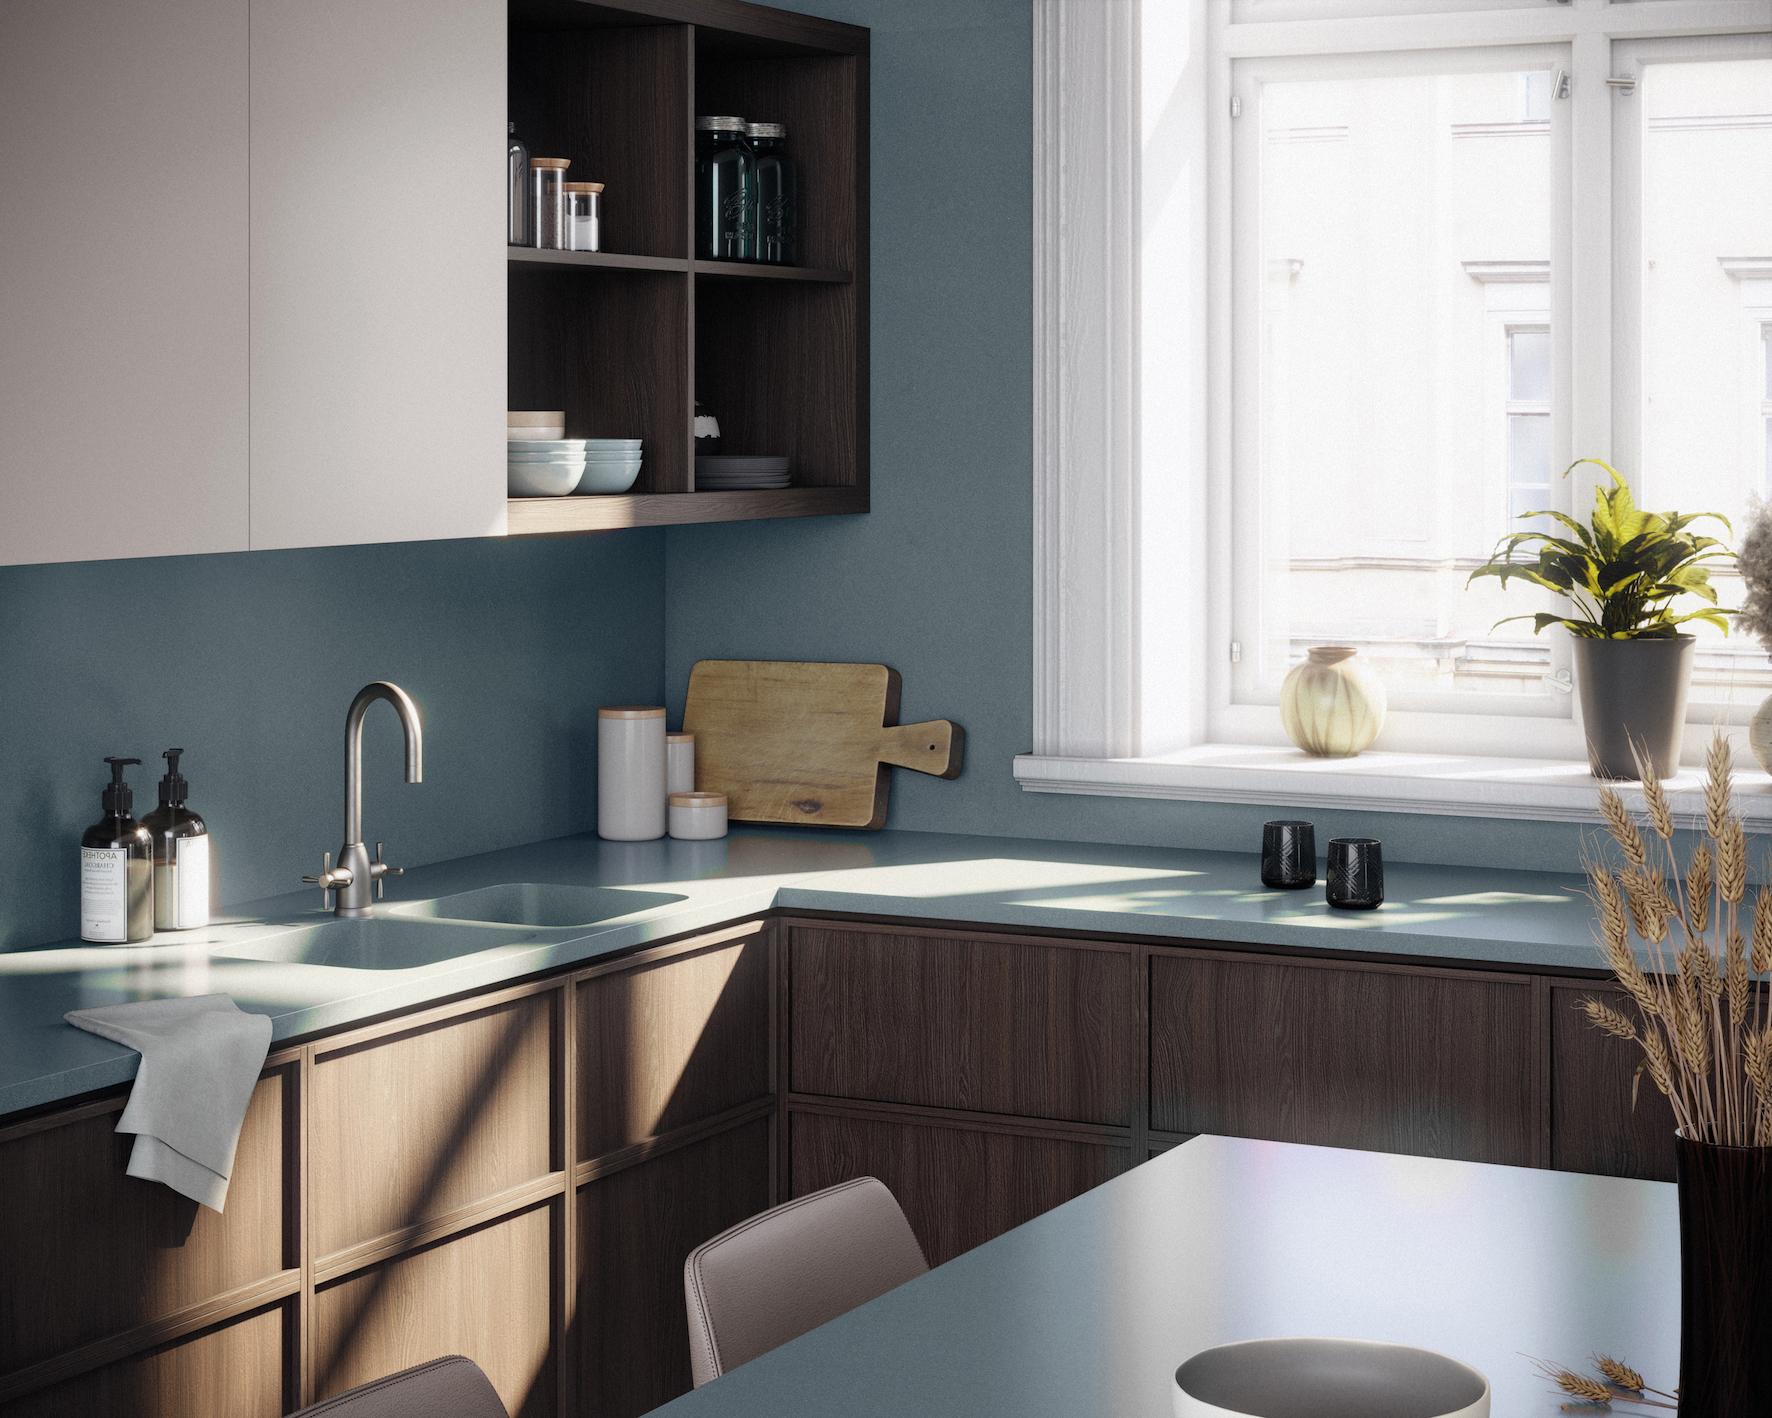 Image of Silestone Sunlit Days Cala Blue Kitchen Lifestyle in Vote for Silestone Sunlit Days in the SBID International Design Awards 2021 - Cosentino